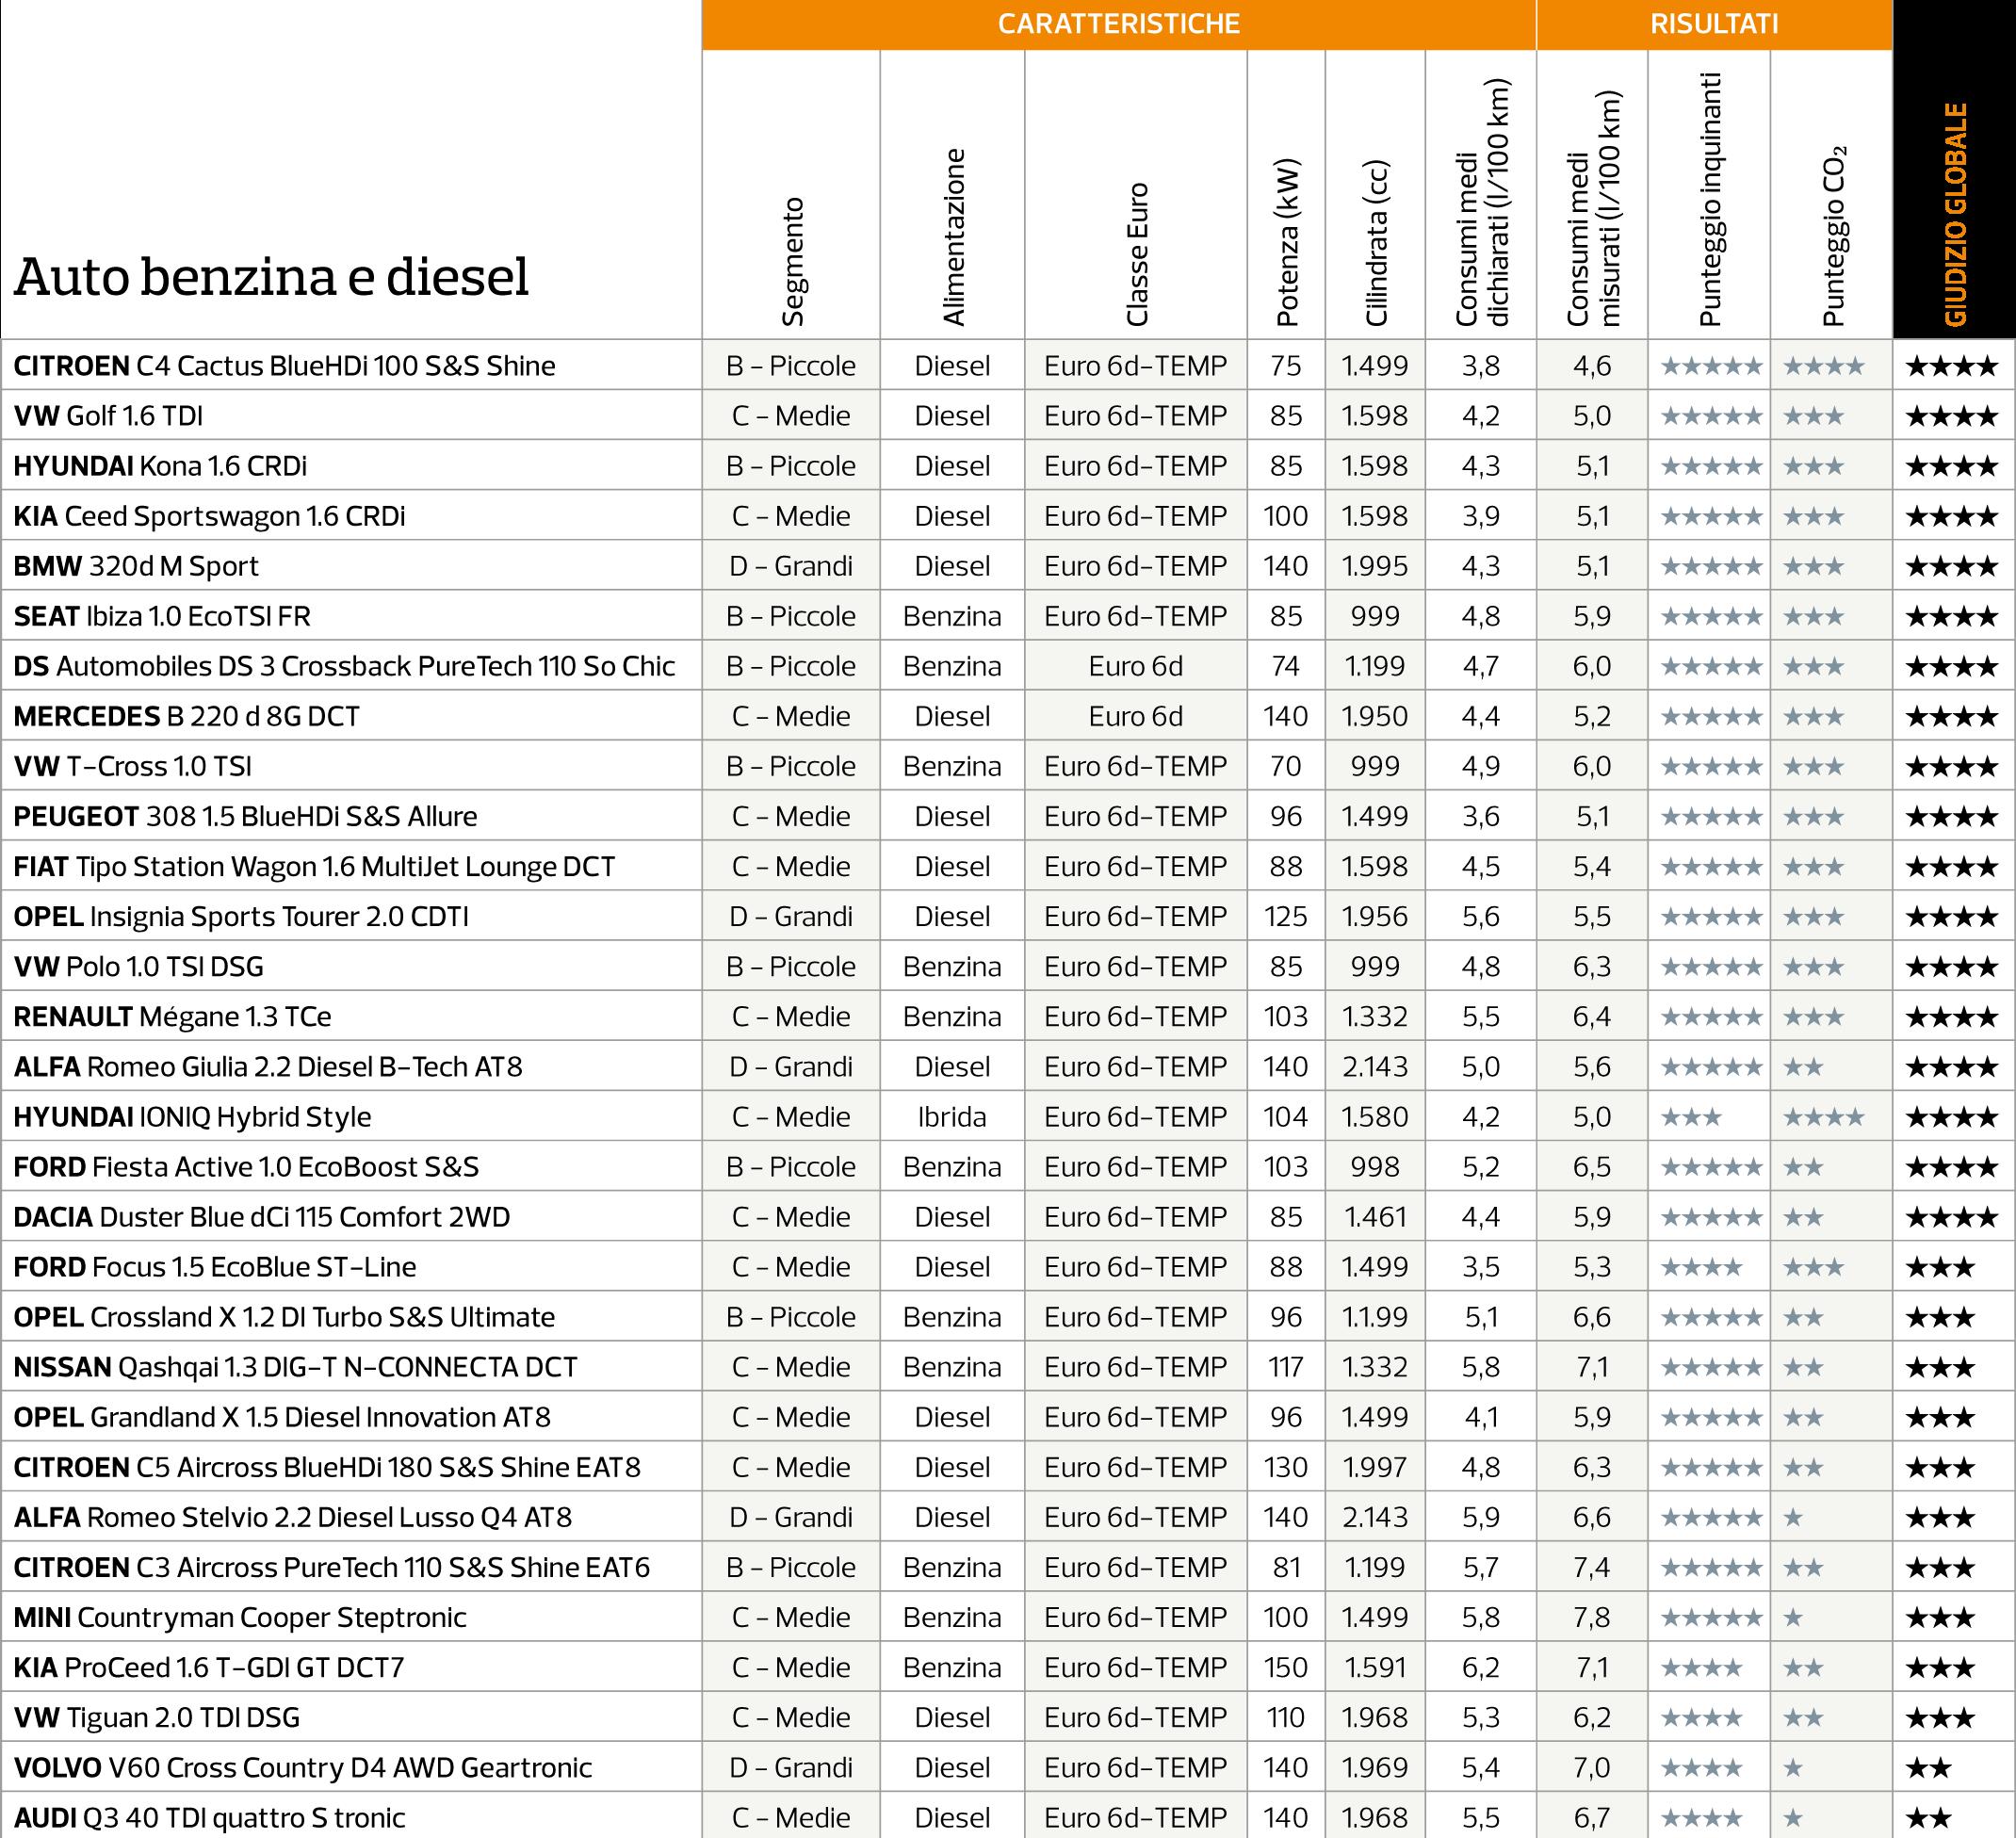 Altroconsumo classifica test emissioni